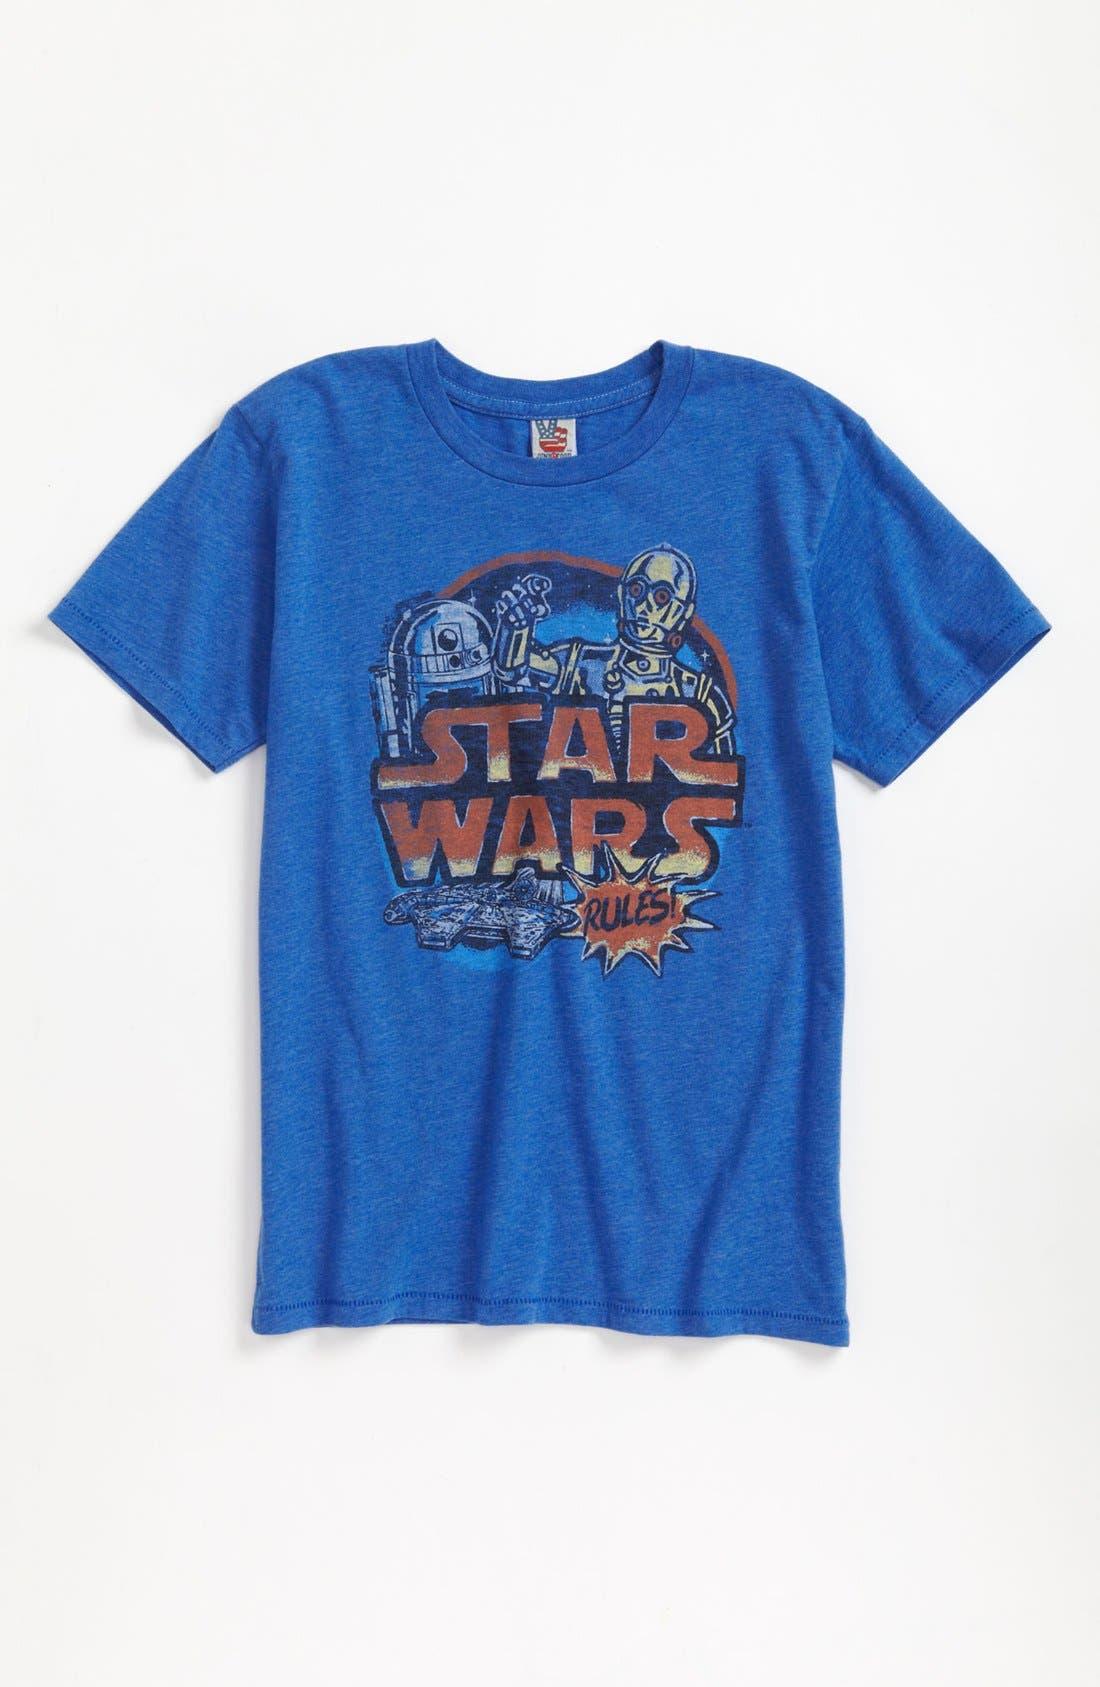 Alternate Image 1 Selected - Junk Food 'Star Wars' T-Shirt (Little Boys & Big Boys)